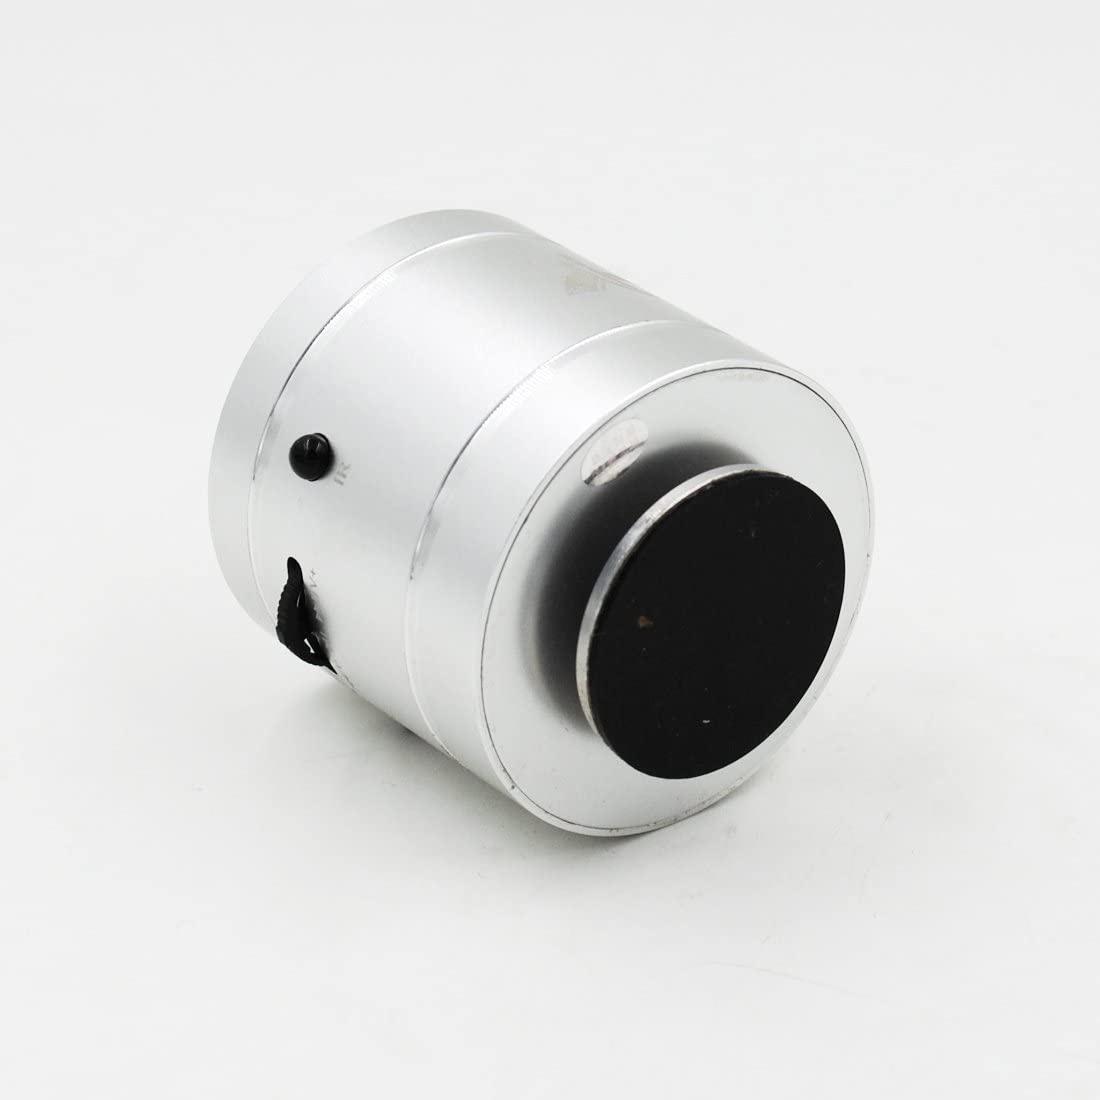 Adin(エイディン) 振動スピーカー d3の商品画像4